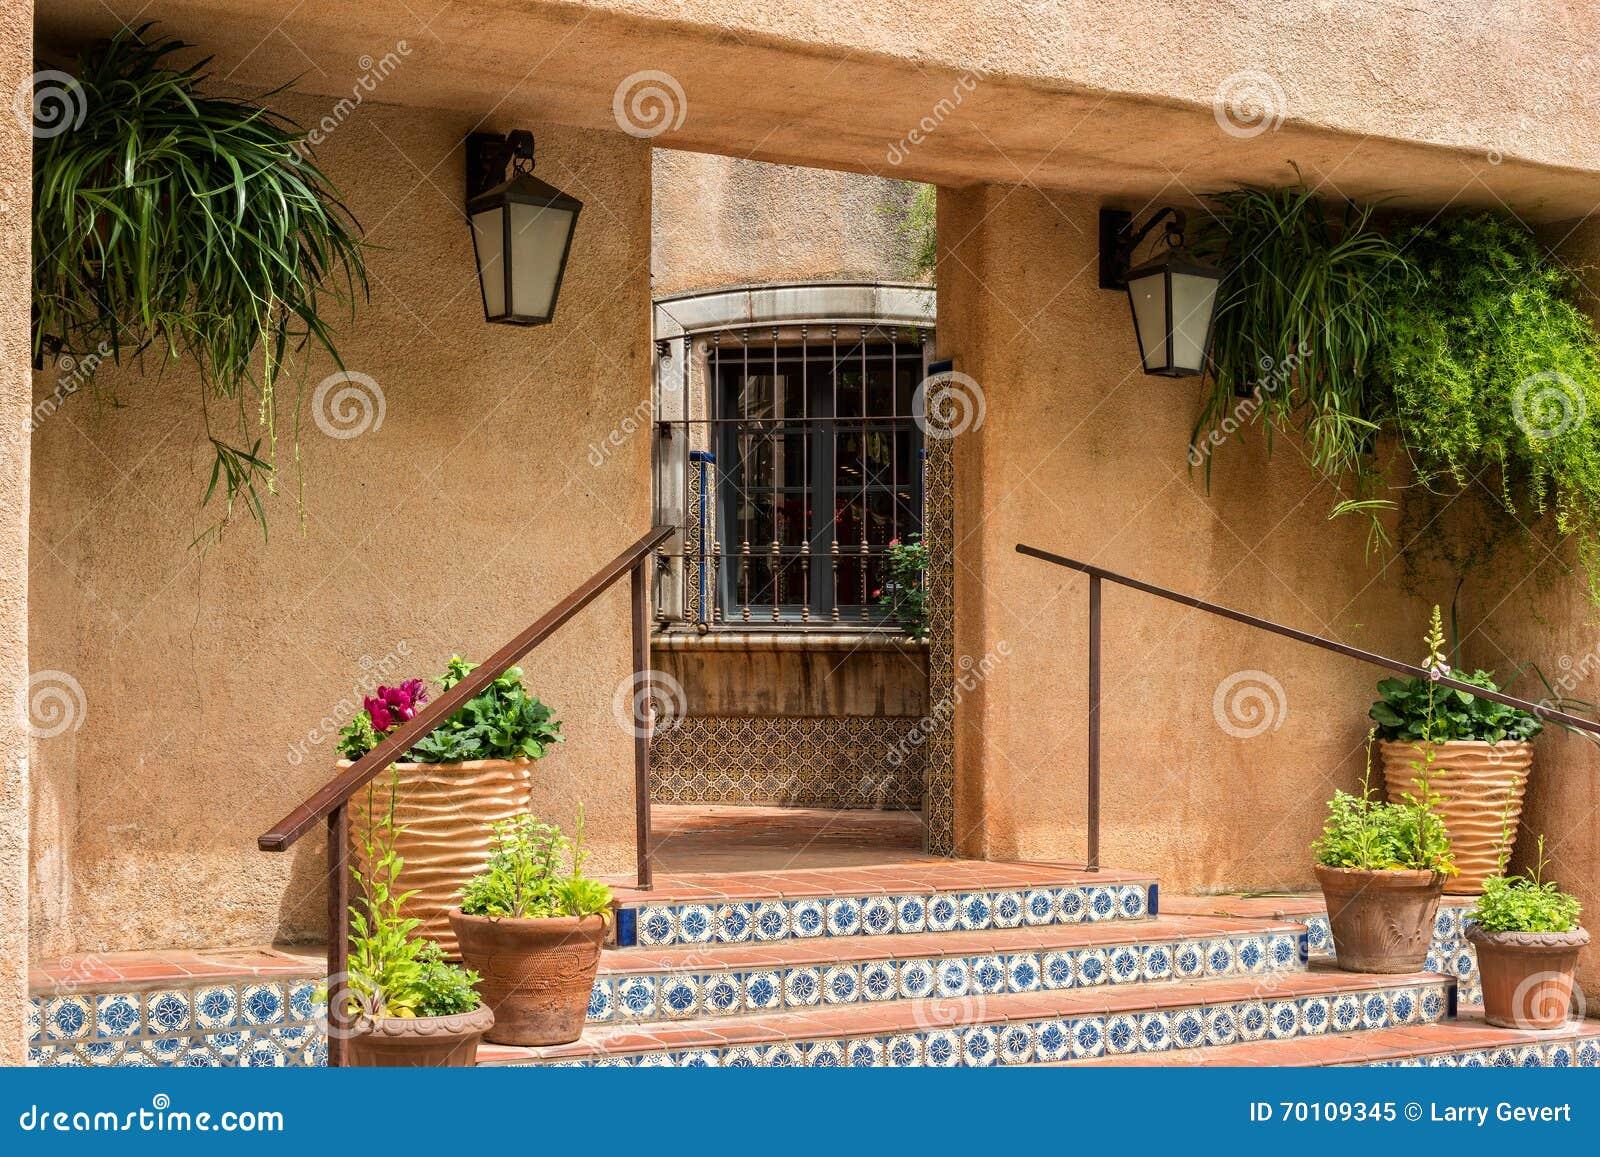 Tlaquepaque Architecture In Sedona Arizona Stock Photo